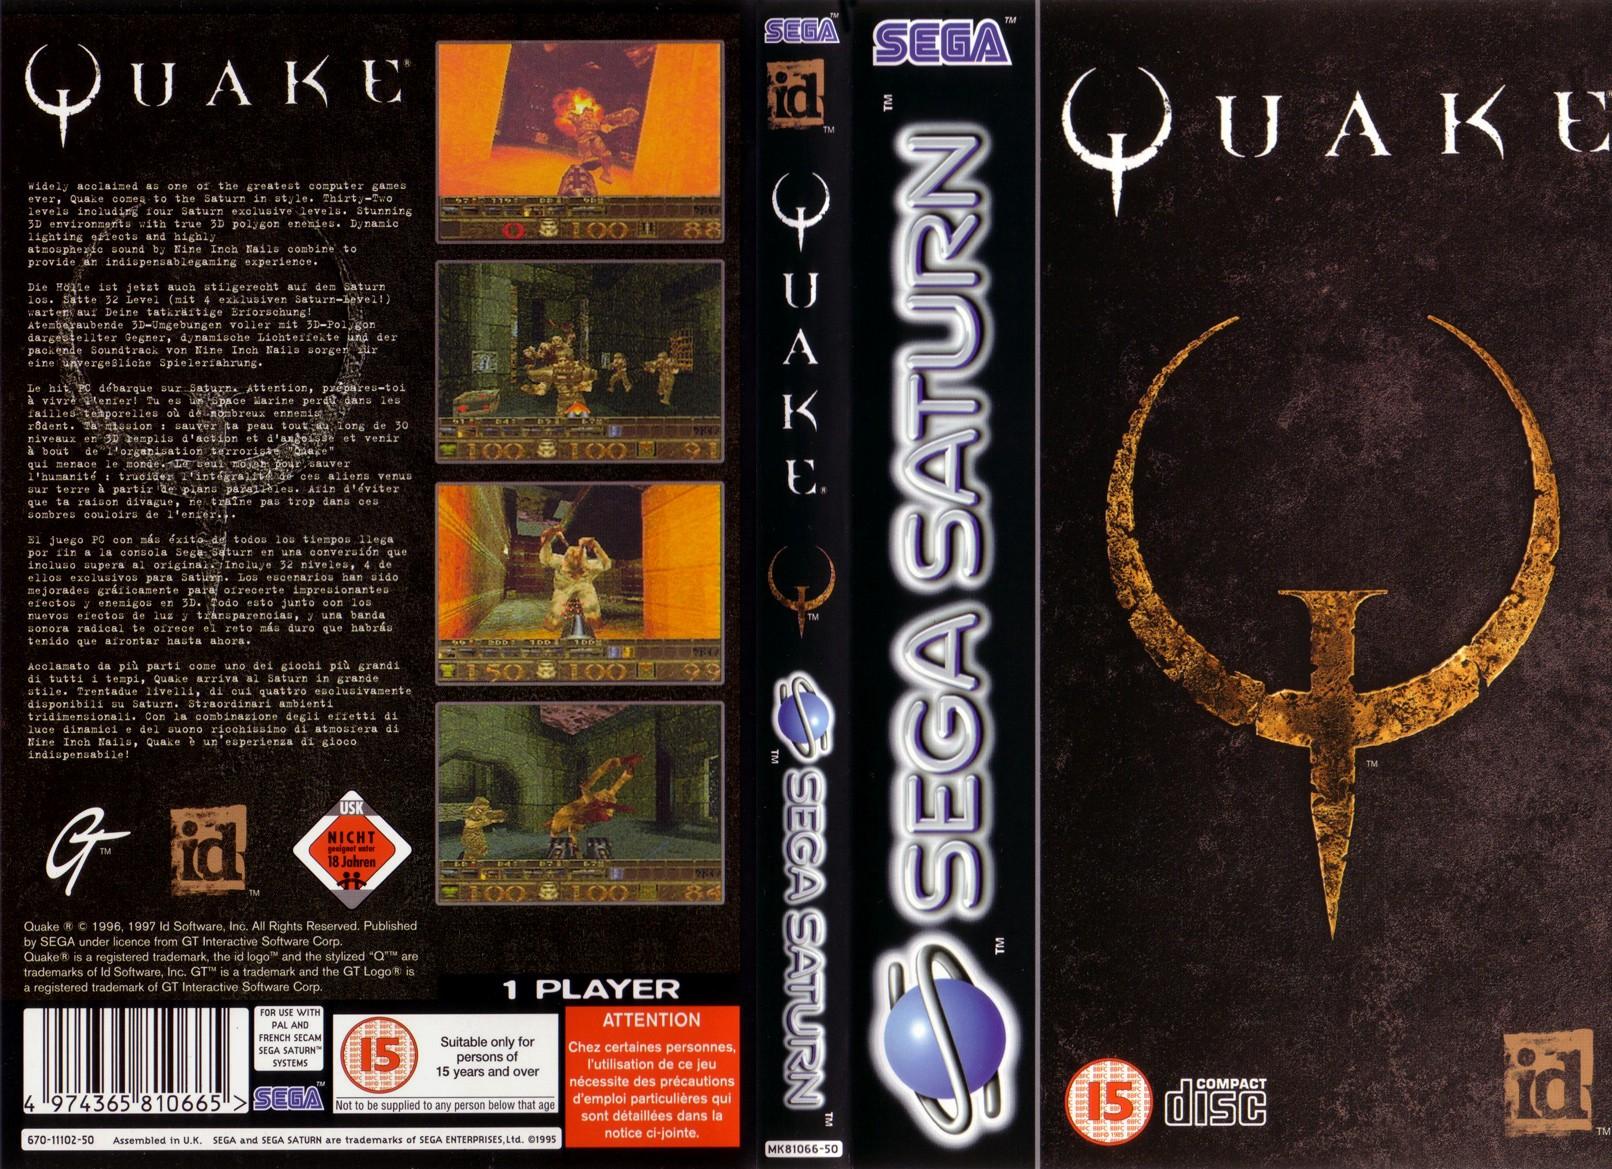 Quake ROM - Sega Saturn (Saturn) | Emulator Games